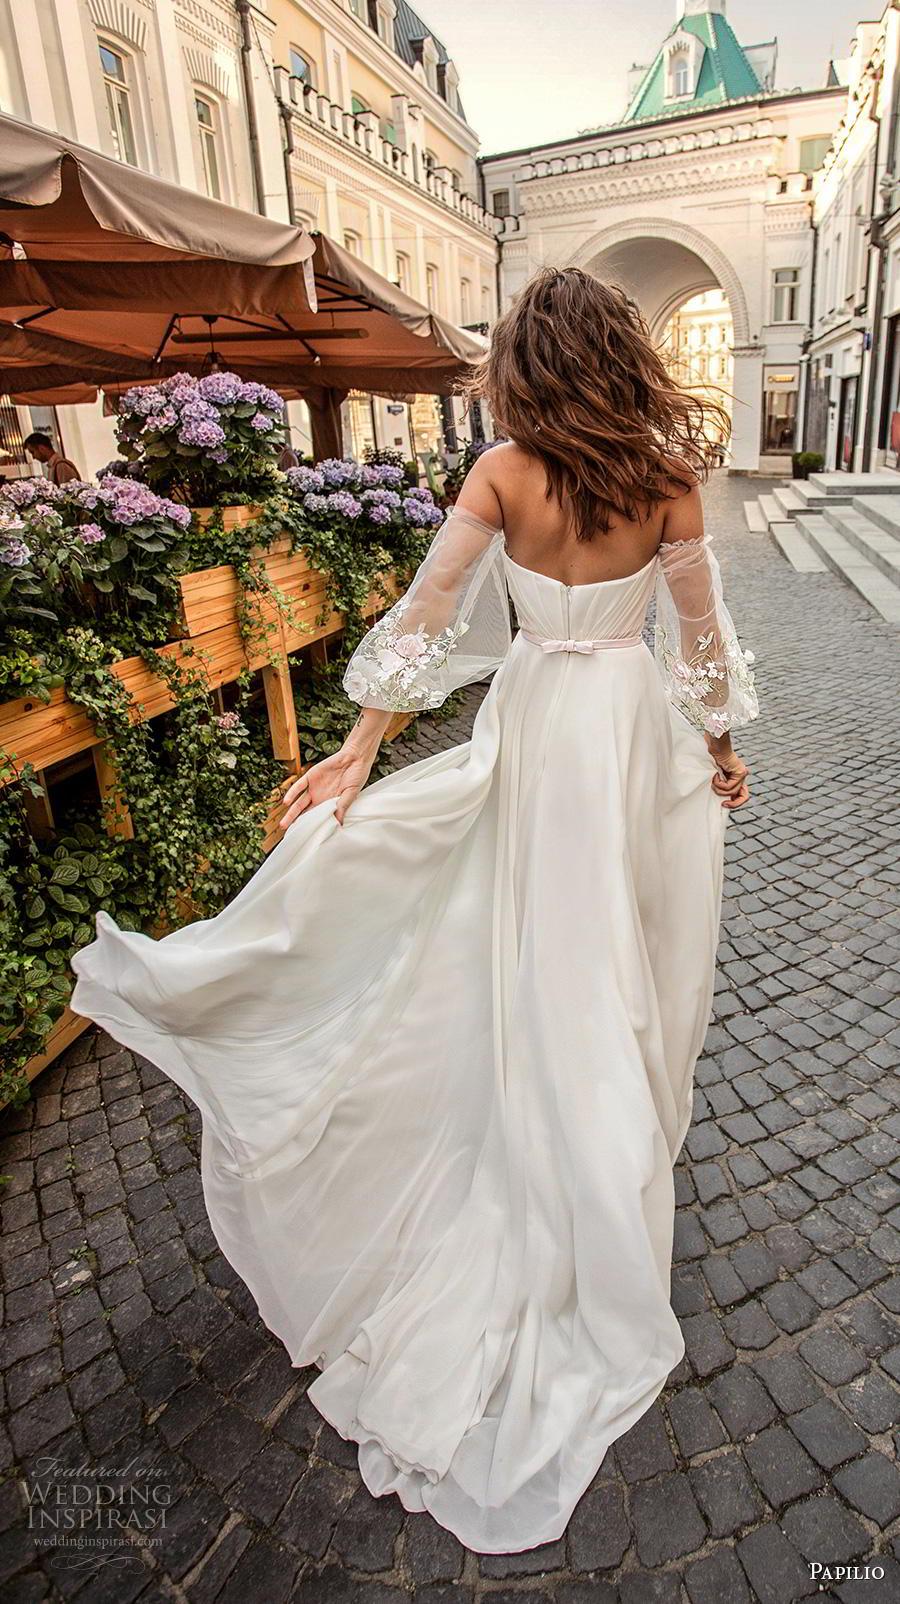 papilio 2019 bridal long bishop sleeves off the shoulder sweetheart neckline wrap over ruched bodice slit skirt romantic a  line wedding dress medium train (1) bv